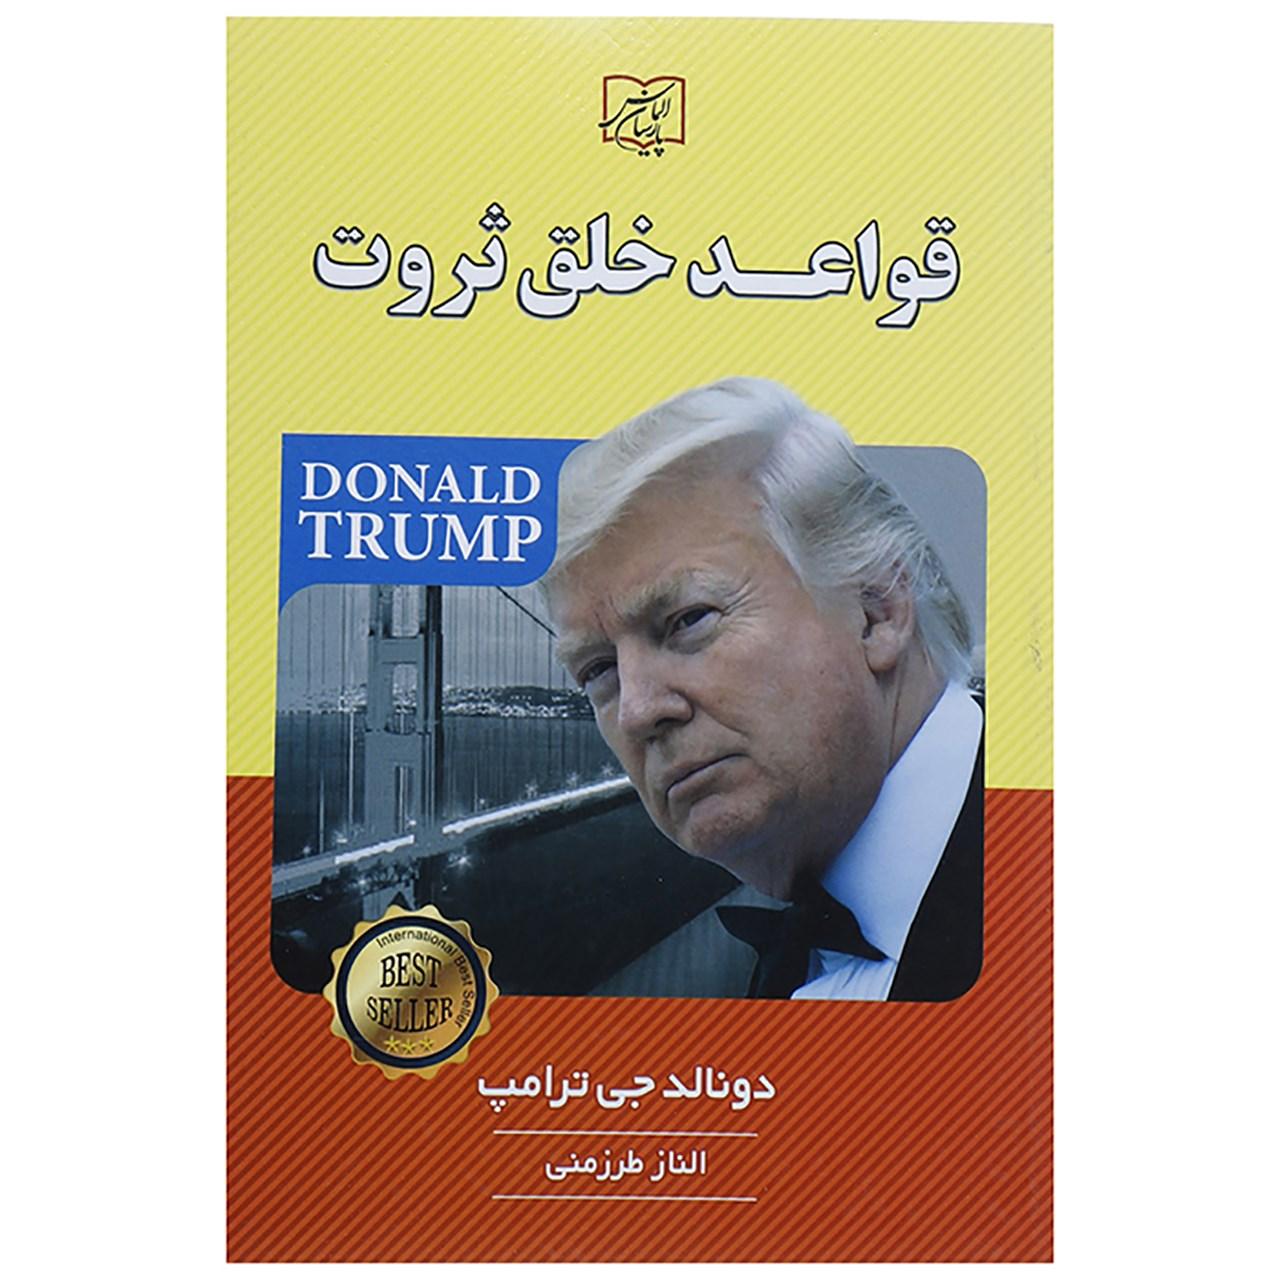 کتاب قواعد خلق ثروت اثر دونالد ترامپ